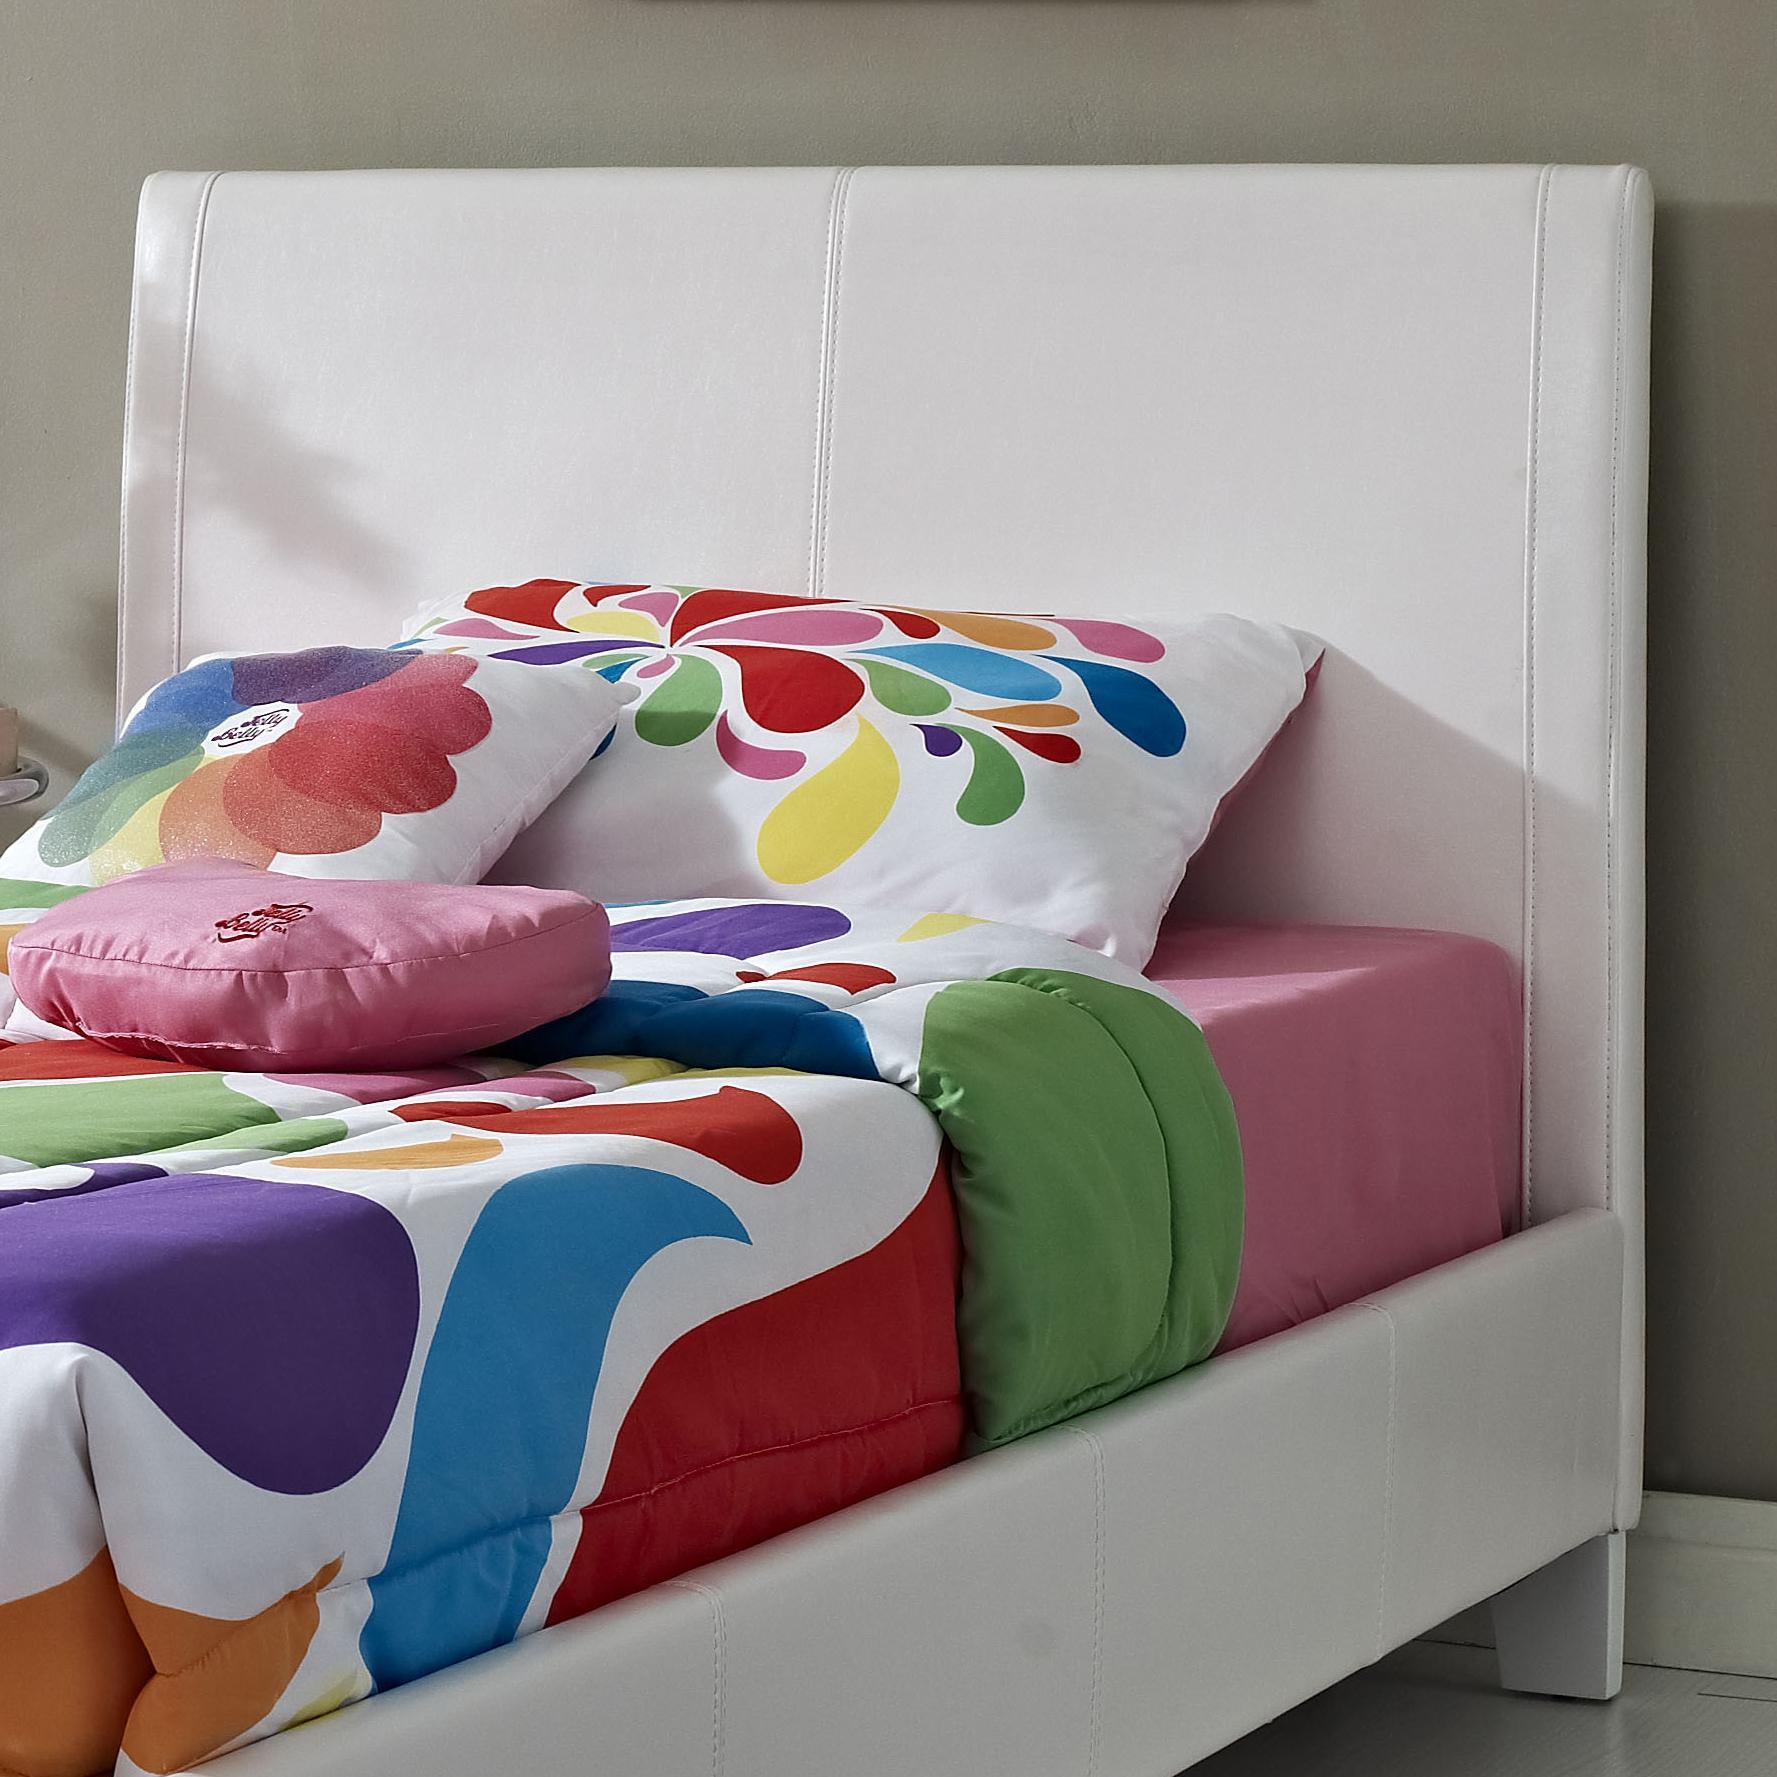 Standard Furniture Fantasia Full Upholstered Headboard - Item Number: 60786